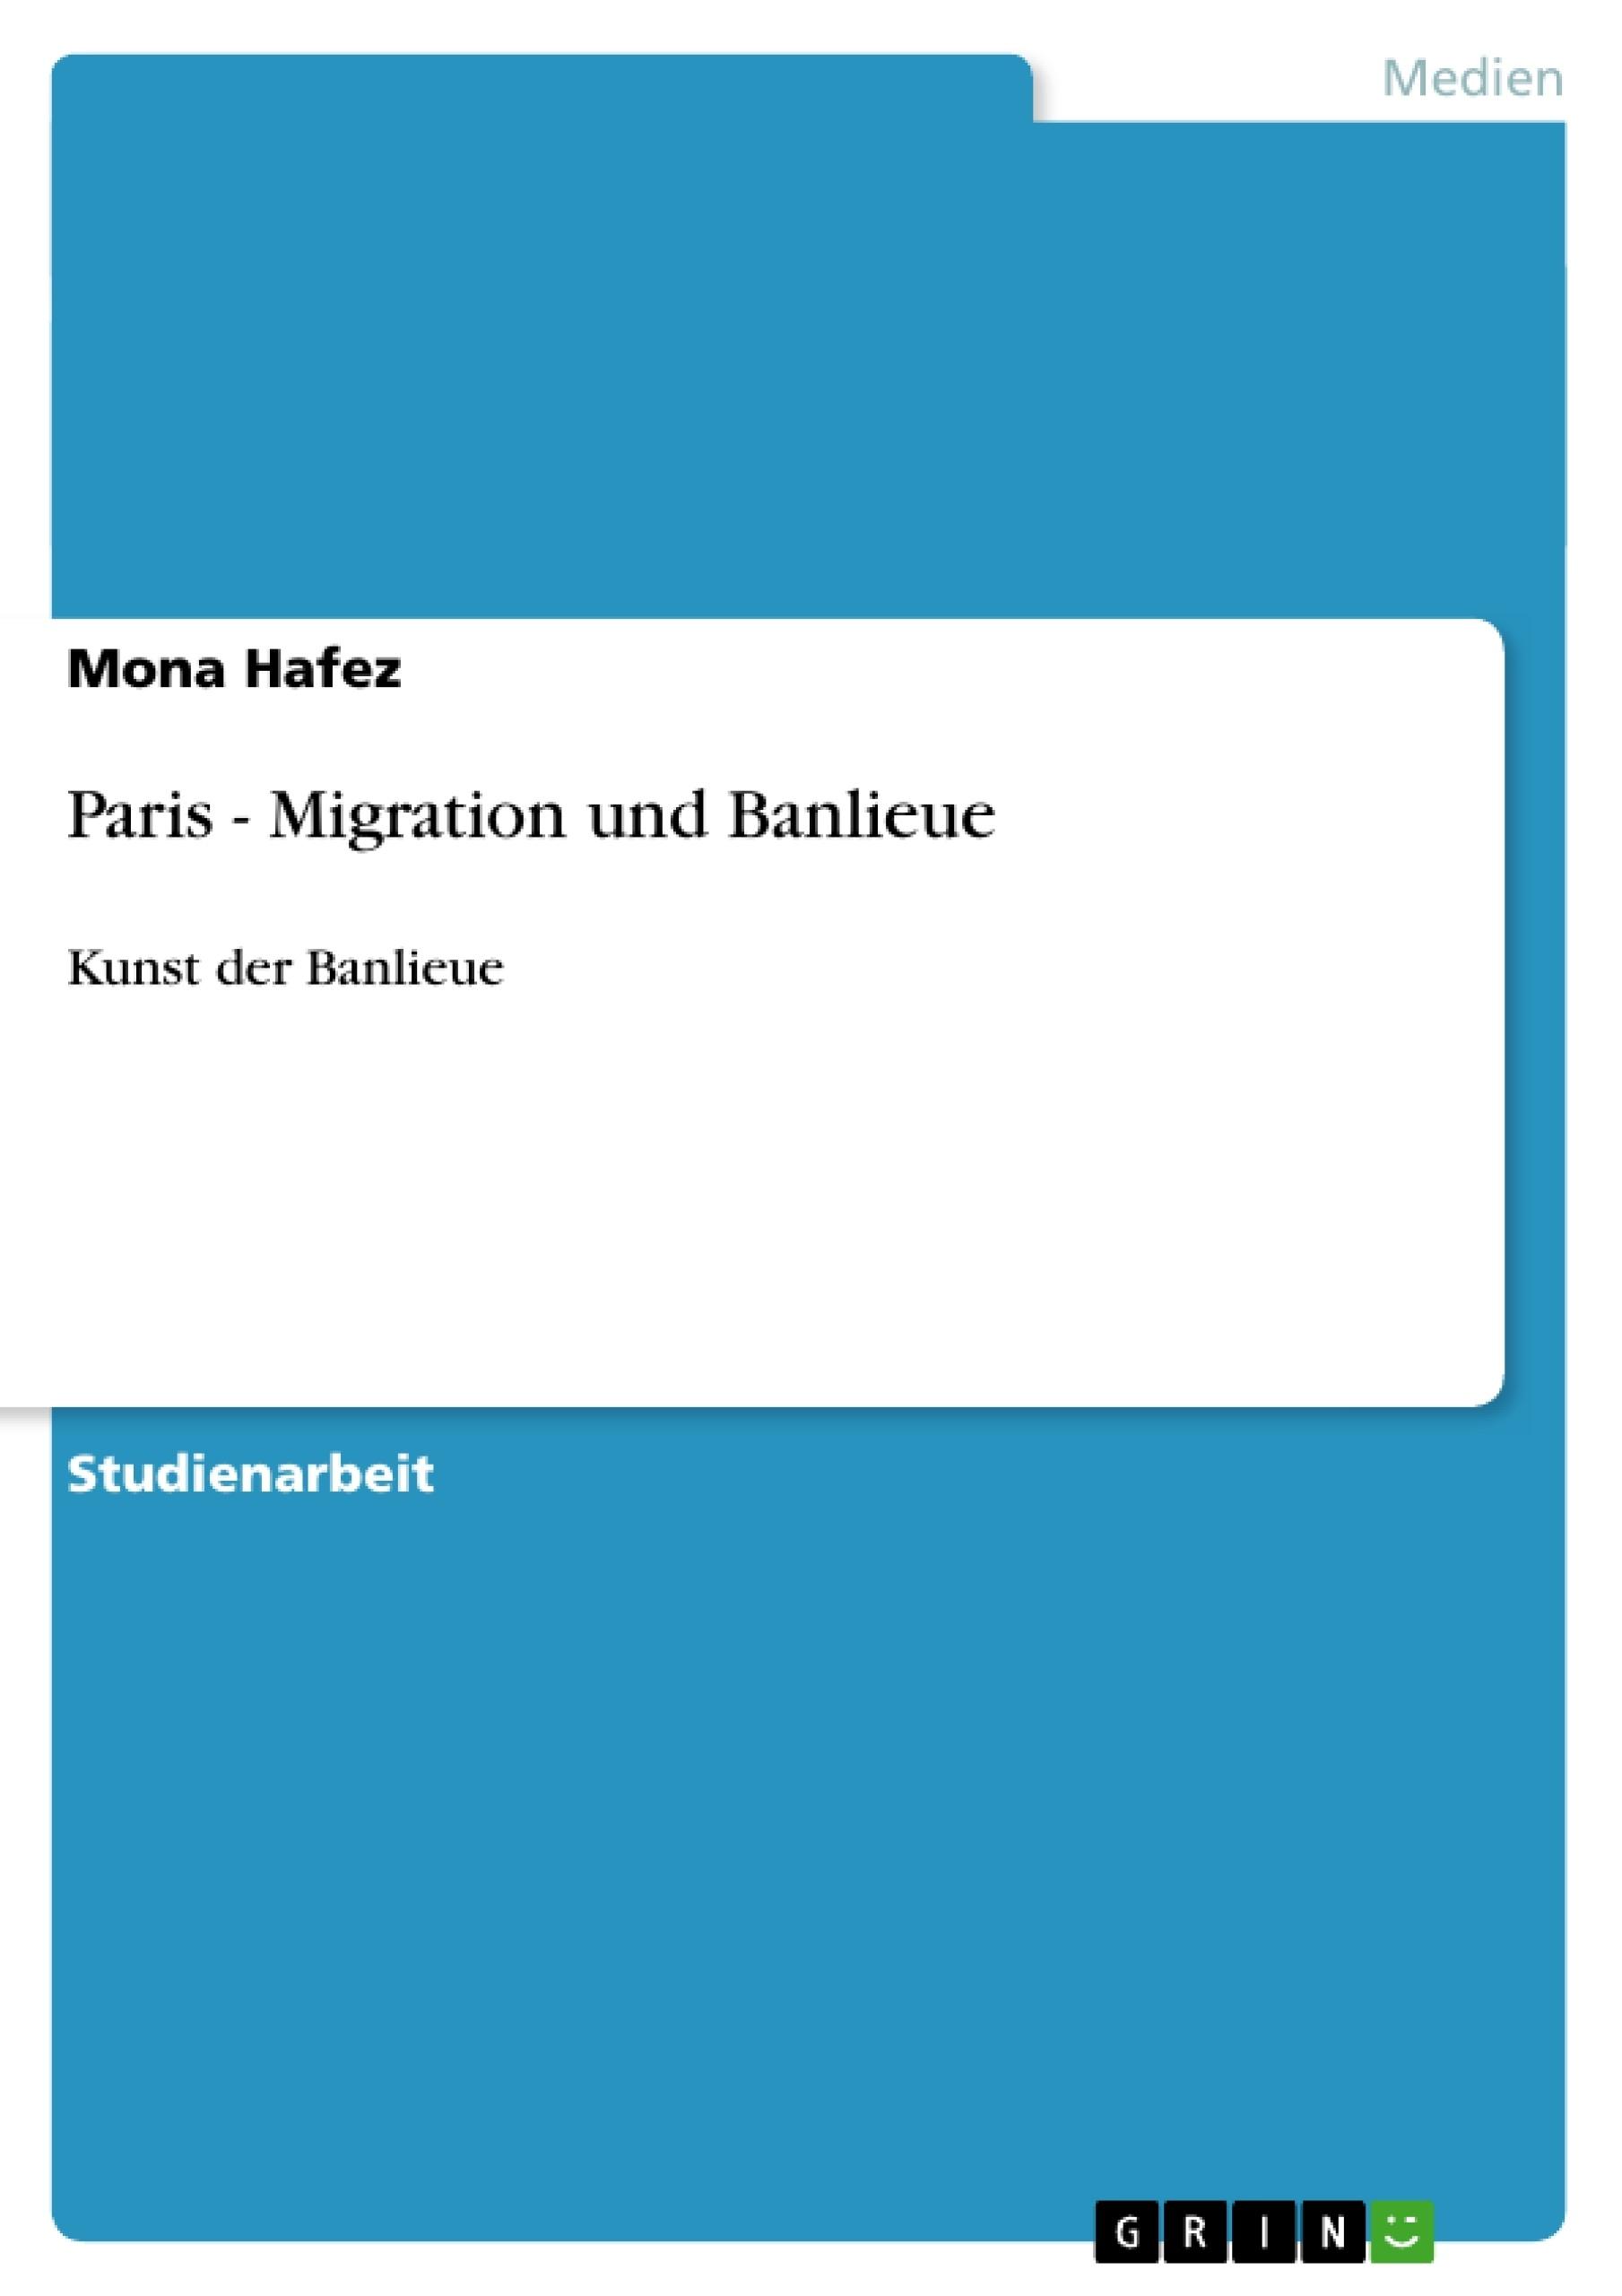 Titel: Paris - Migration und Banlieue